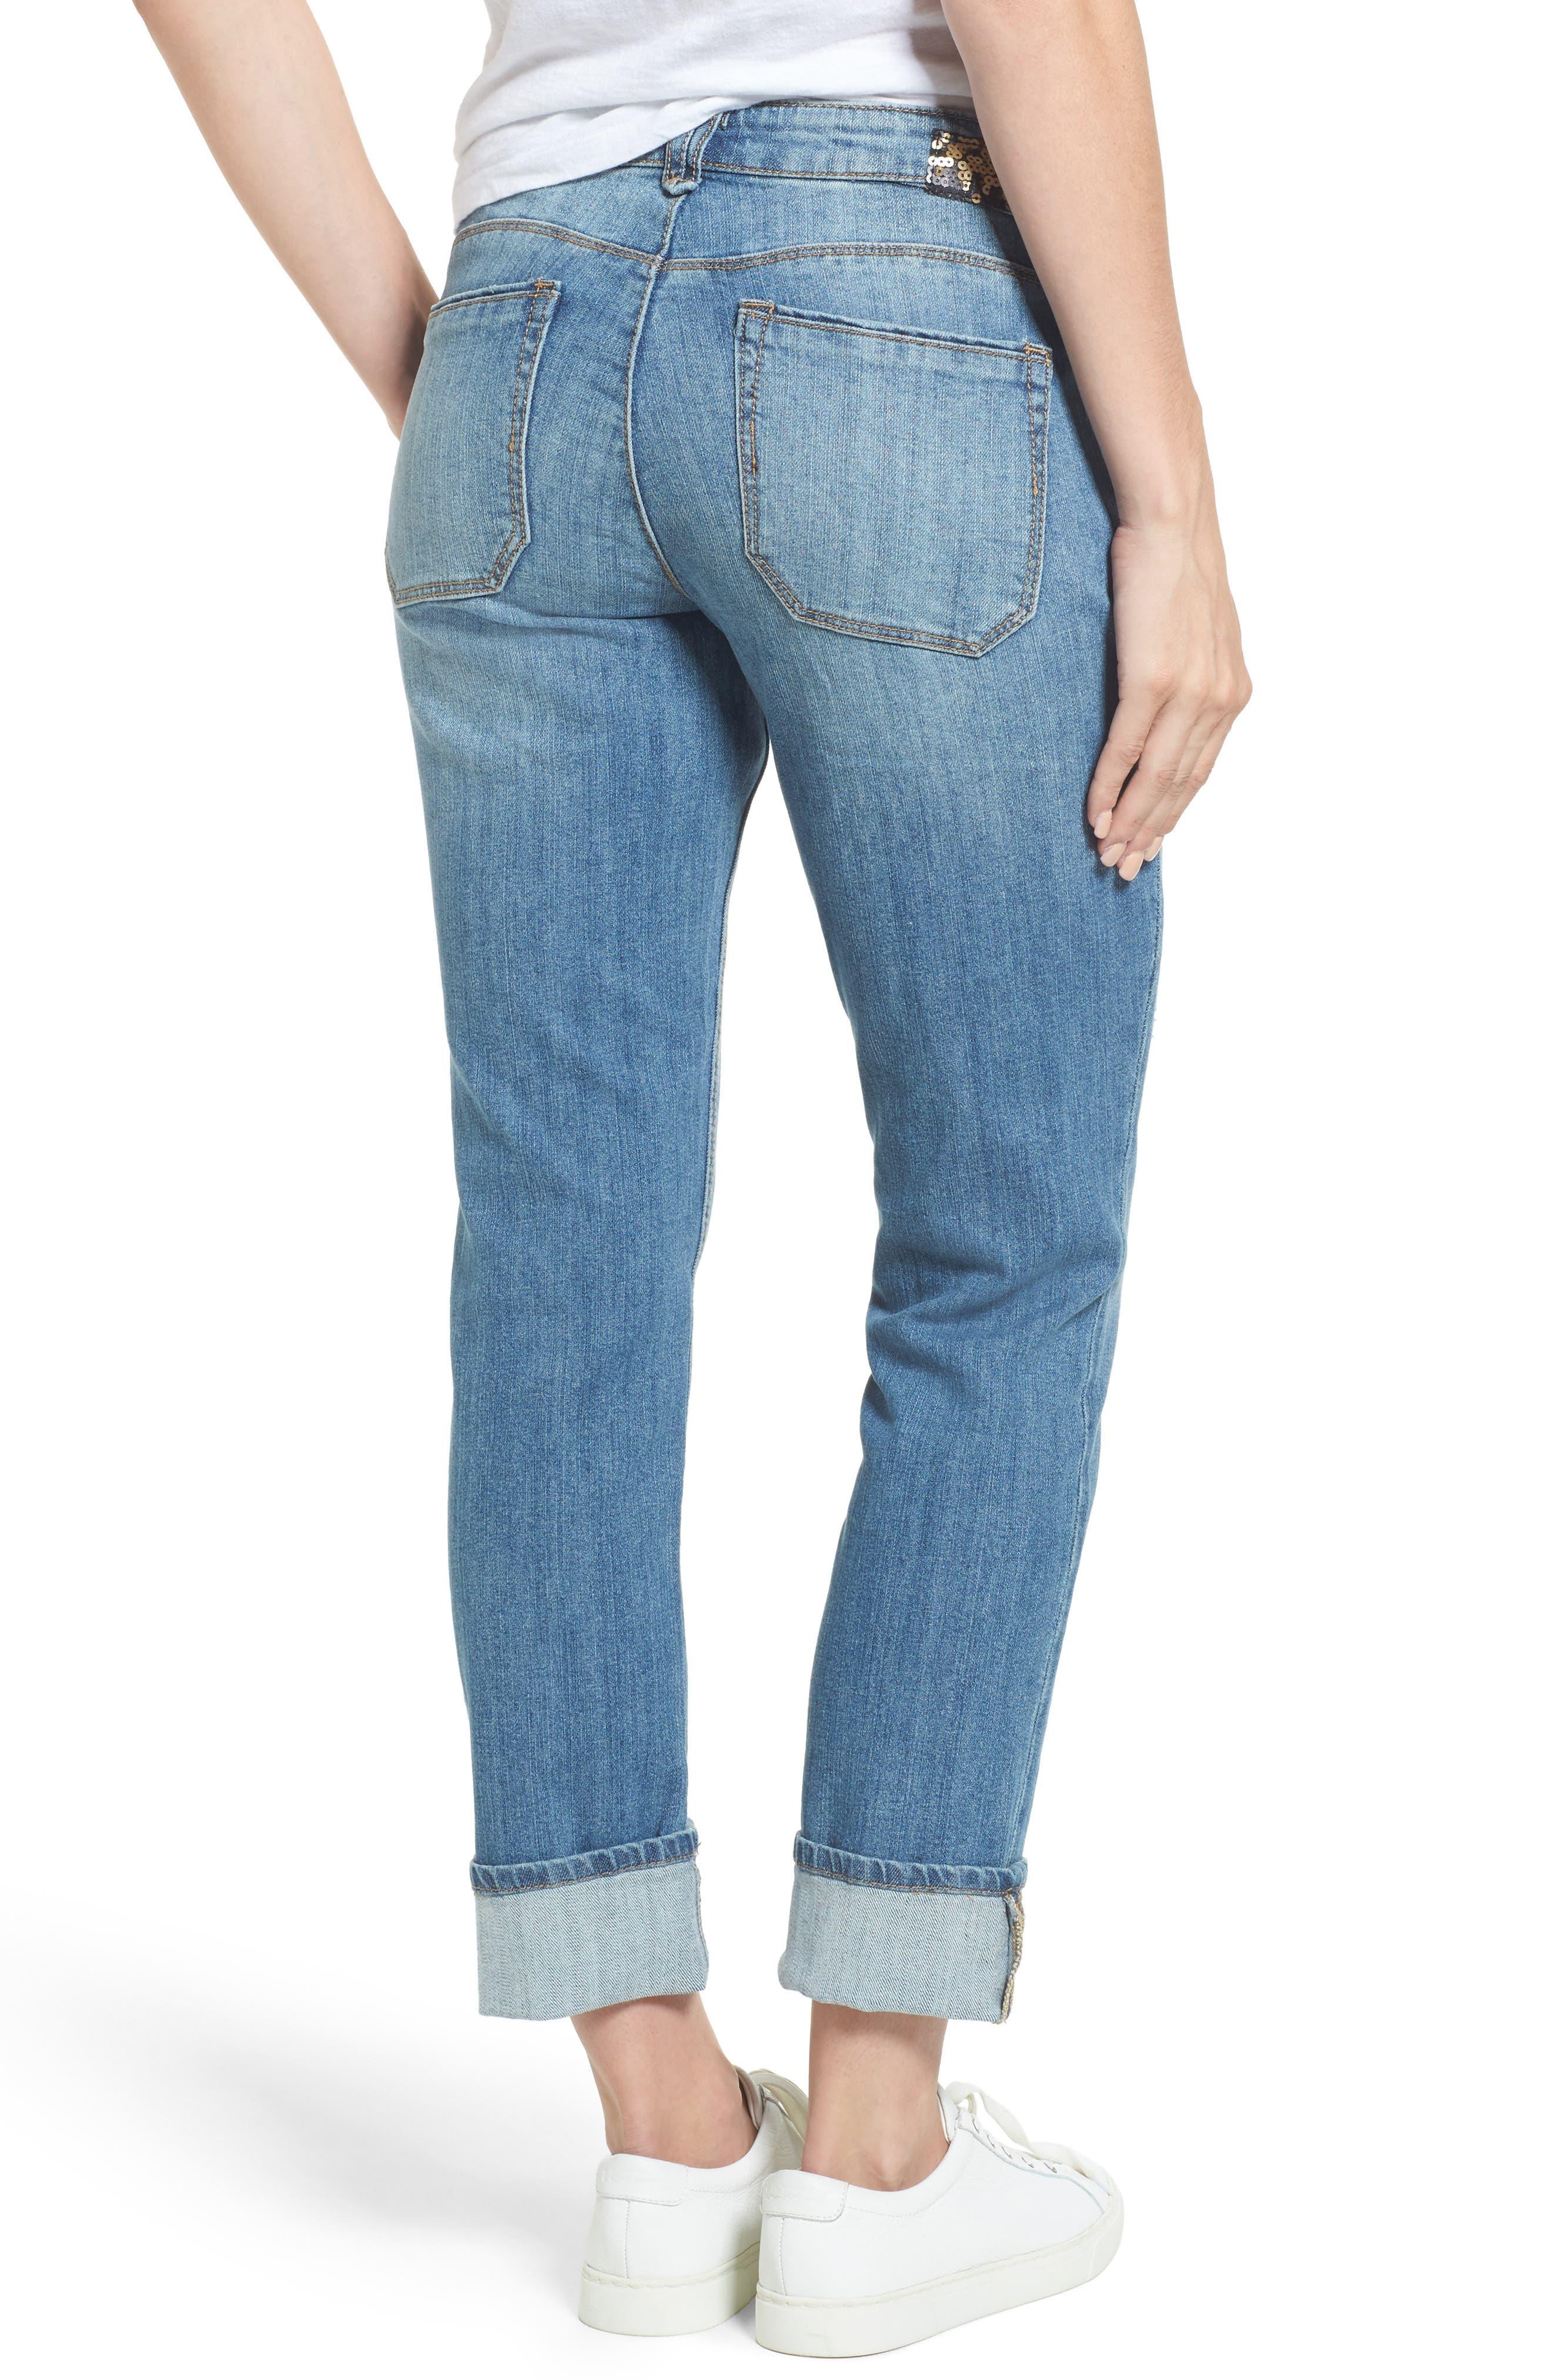 Alternate Image 2  - Wit & Wisdom Flexellent Skinny Girlfriend Jeans (Nordstrom Exclusive)